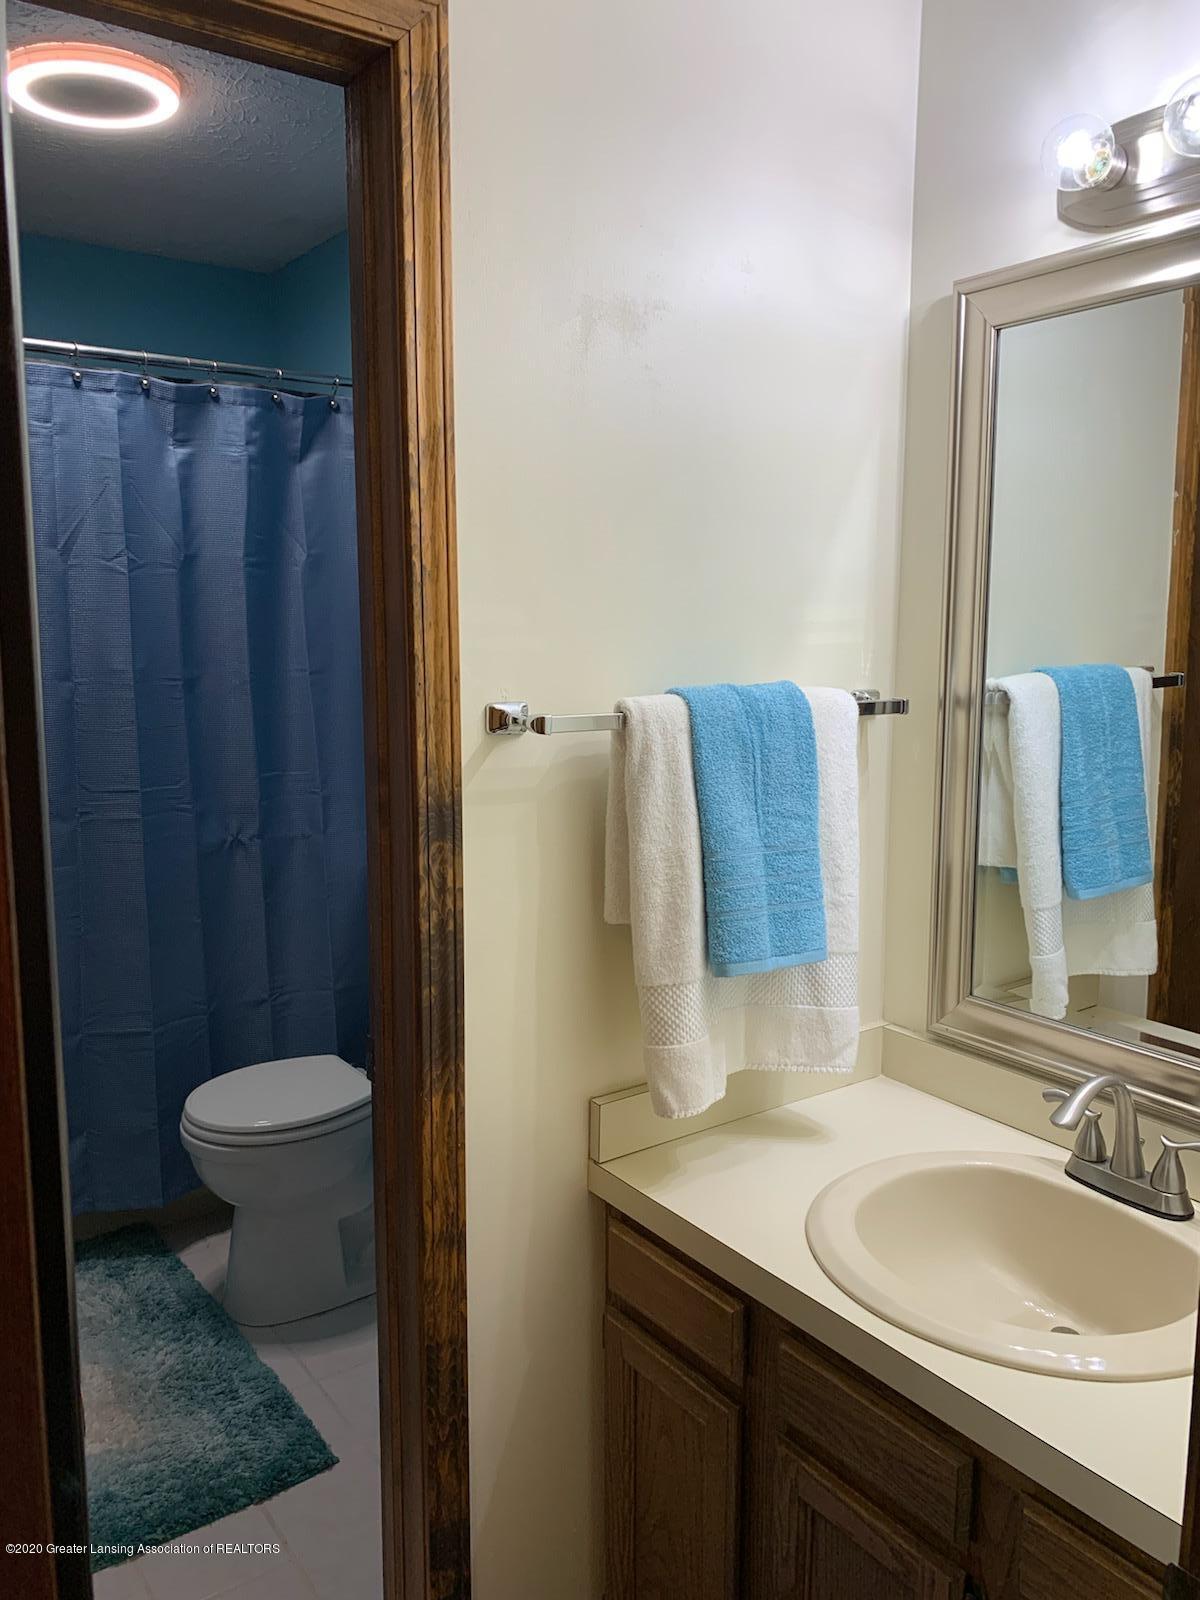 2410 Sower Blvd - 17-full bath - 19